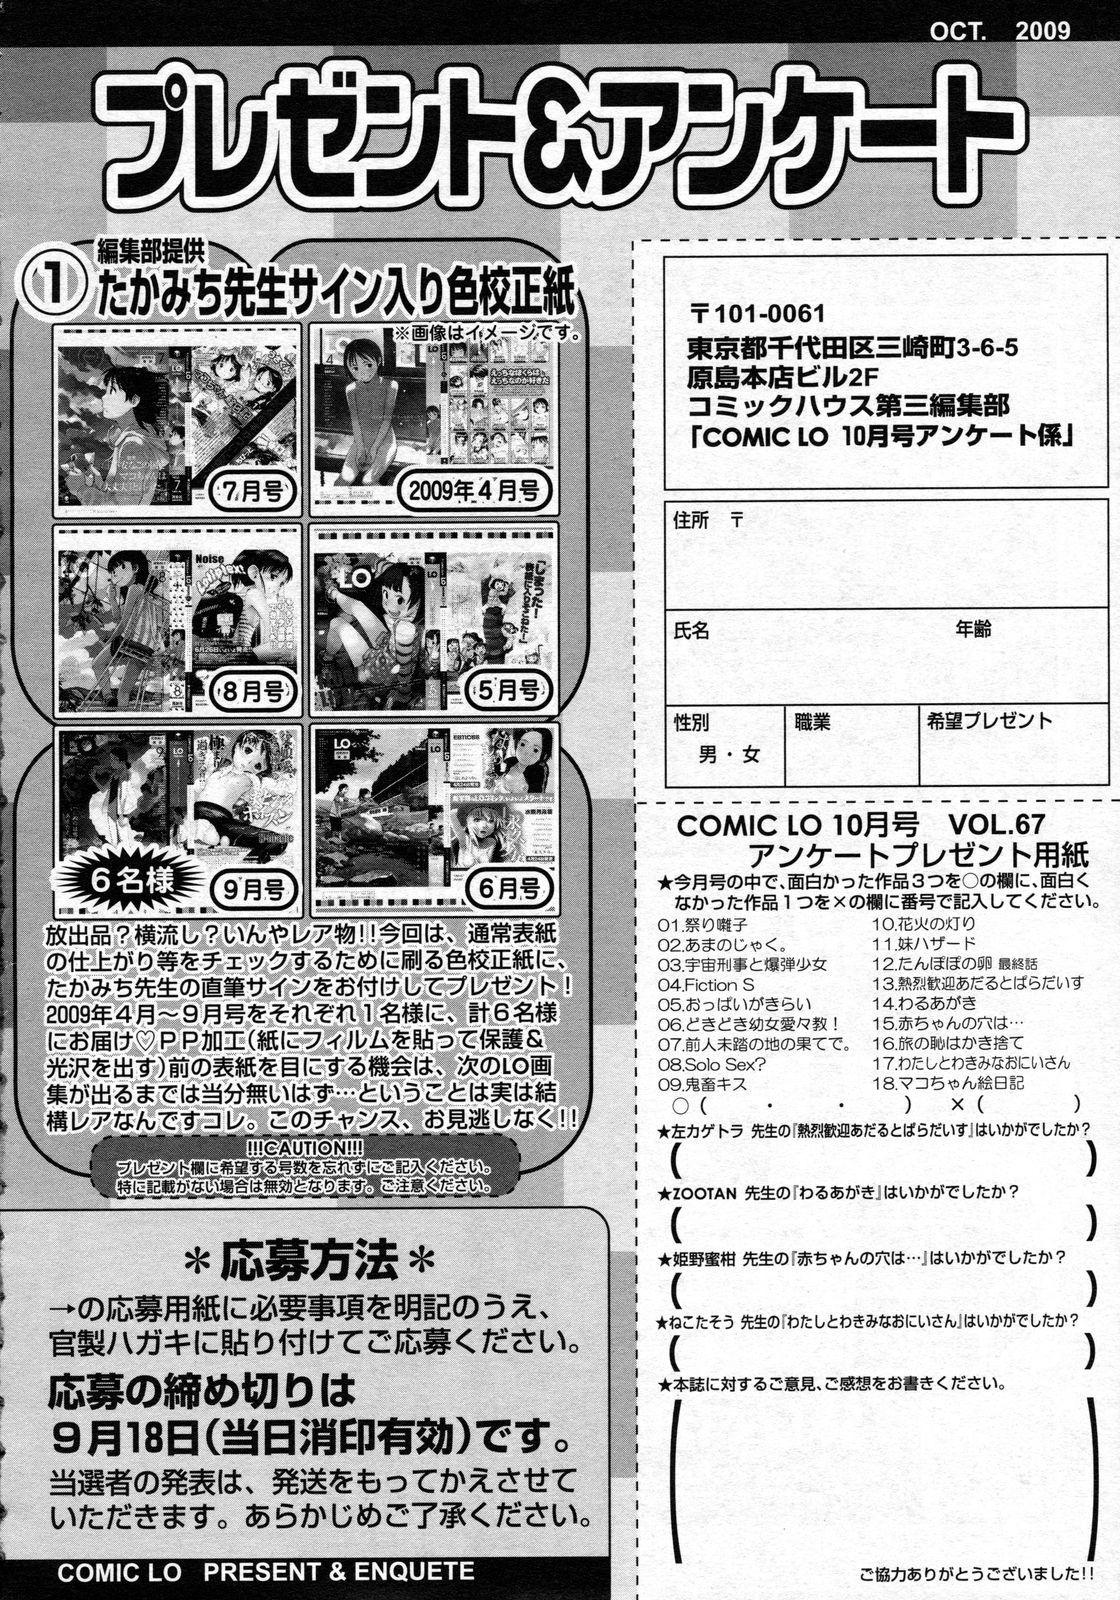 COMIC LO 2009-10 Vol. 67 356